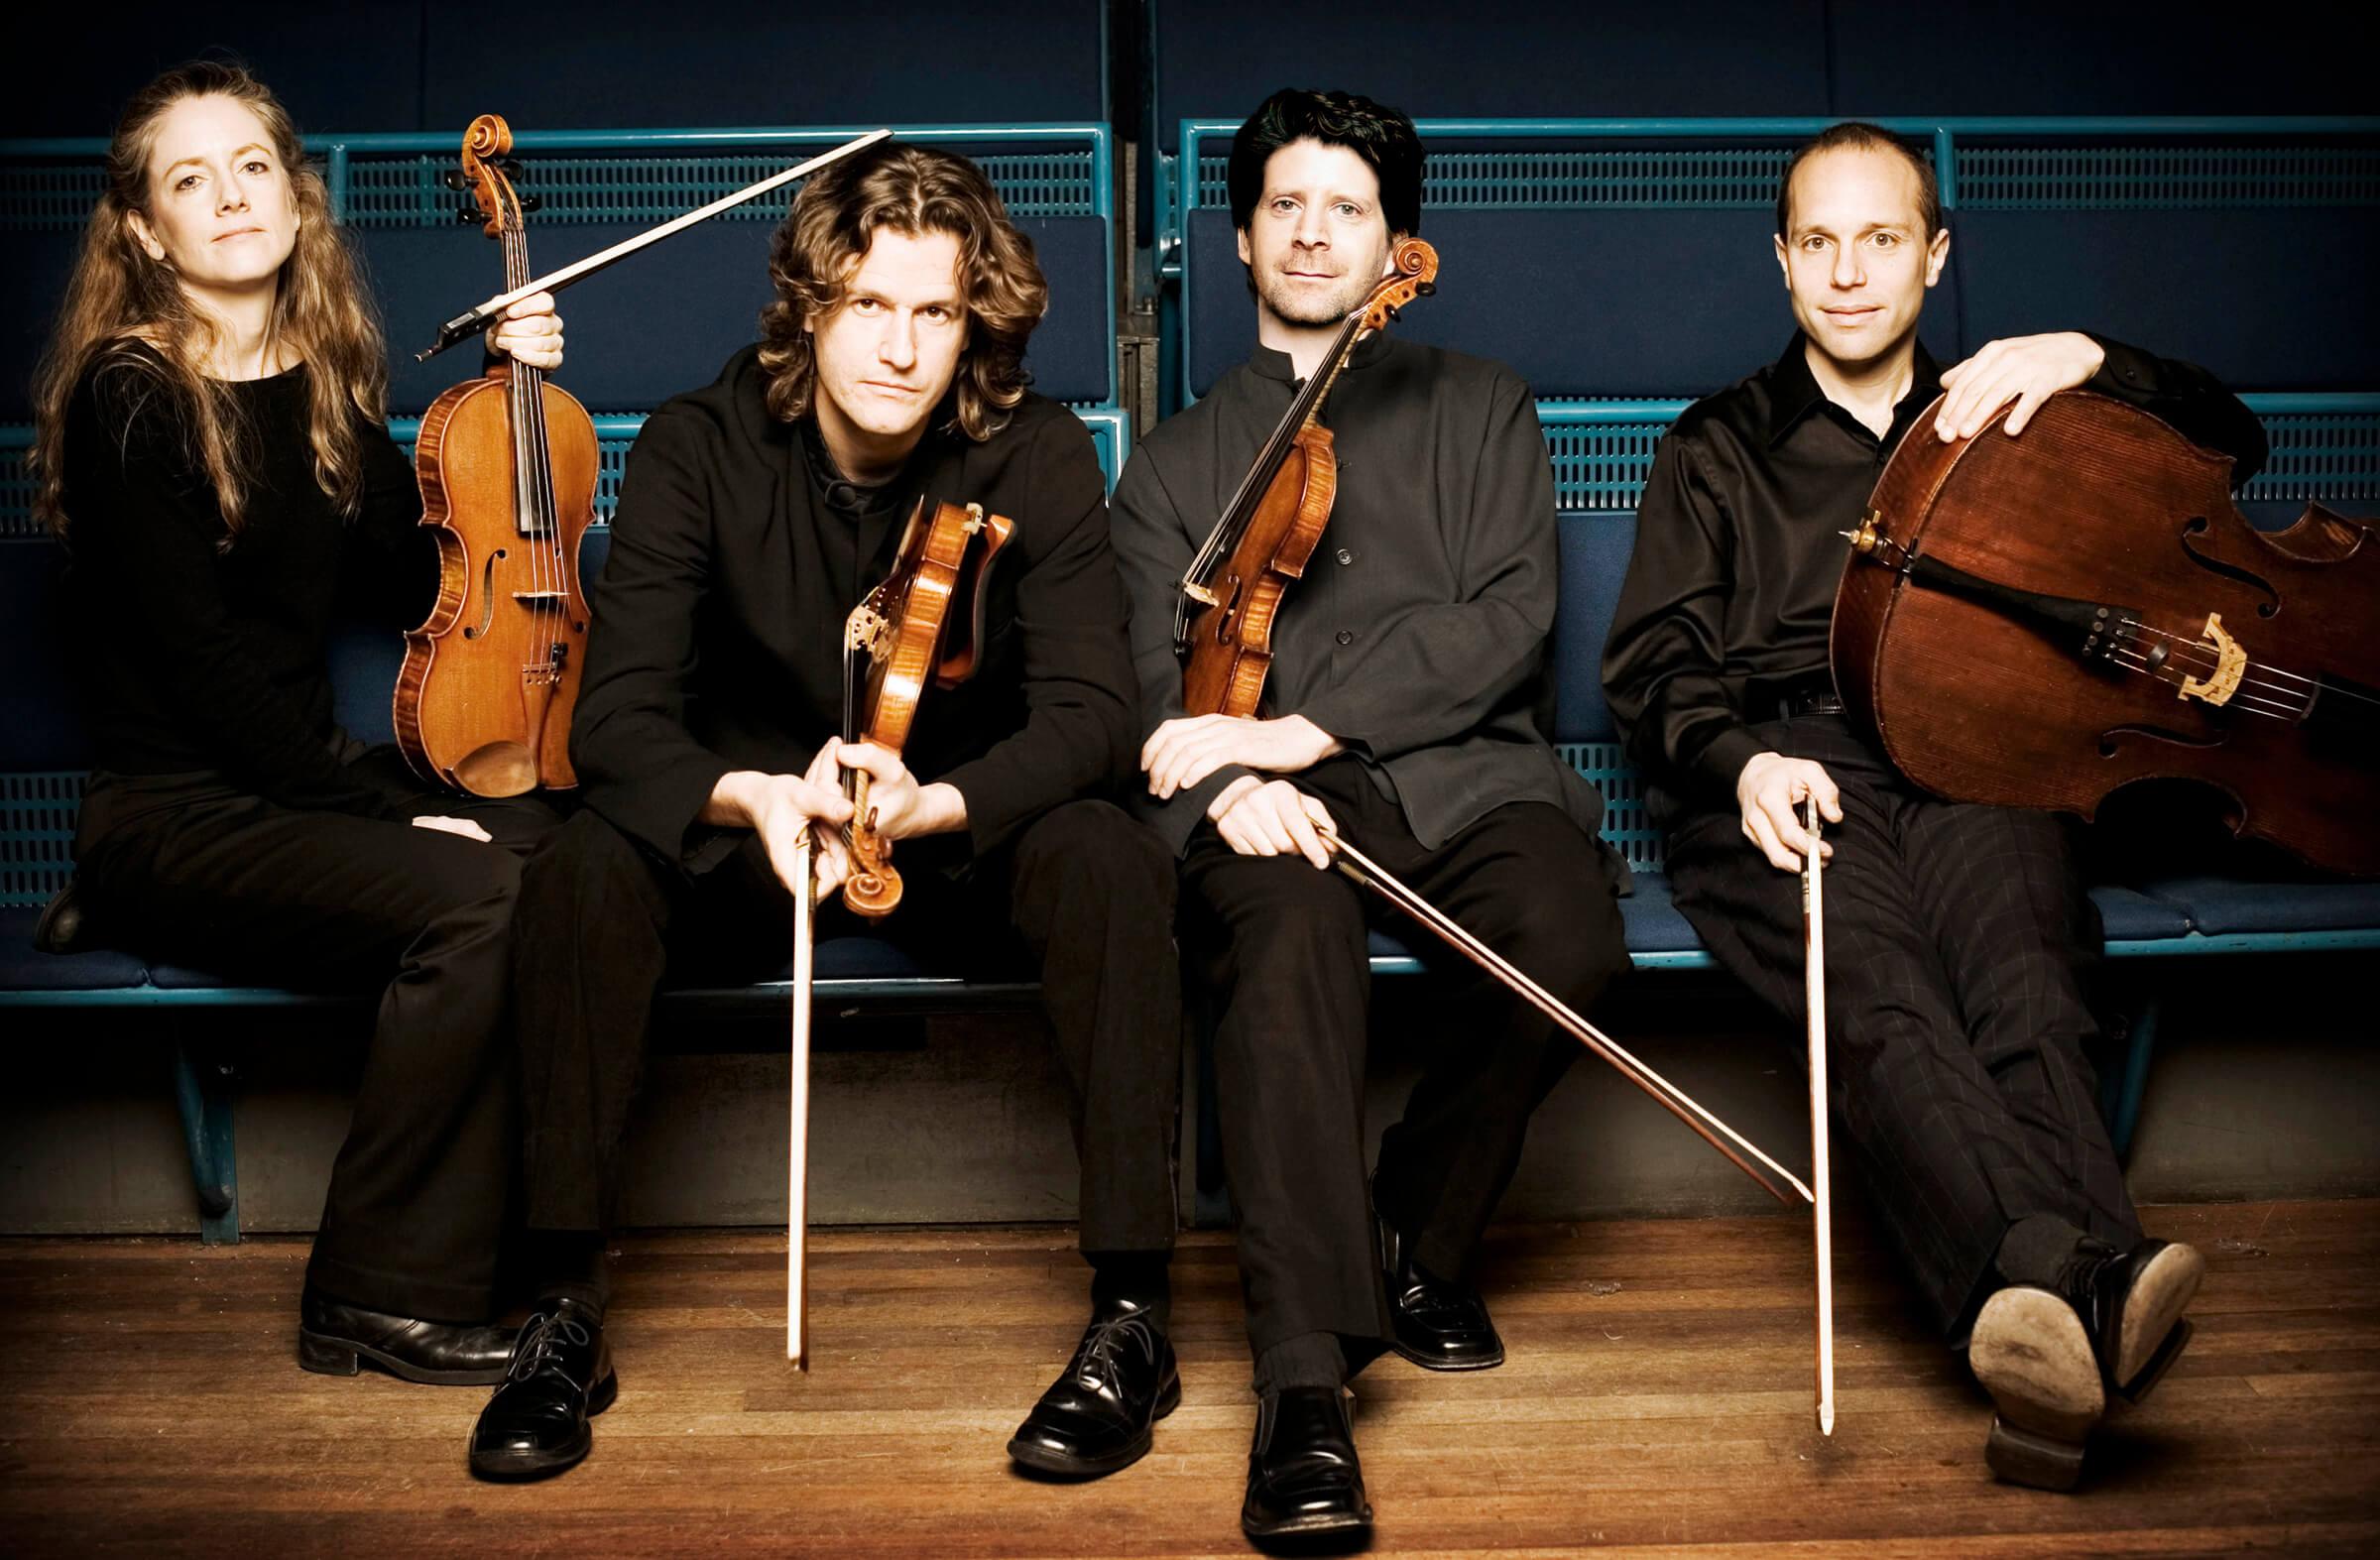 Electric-string-quartet-show-hire-vitamin-string-quartet